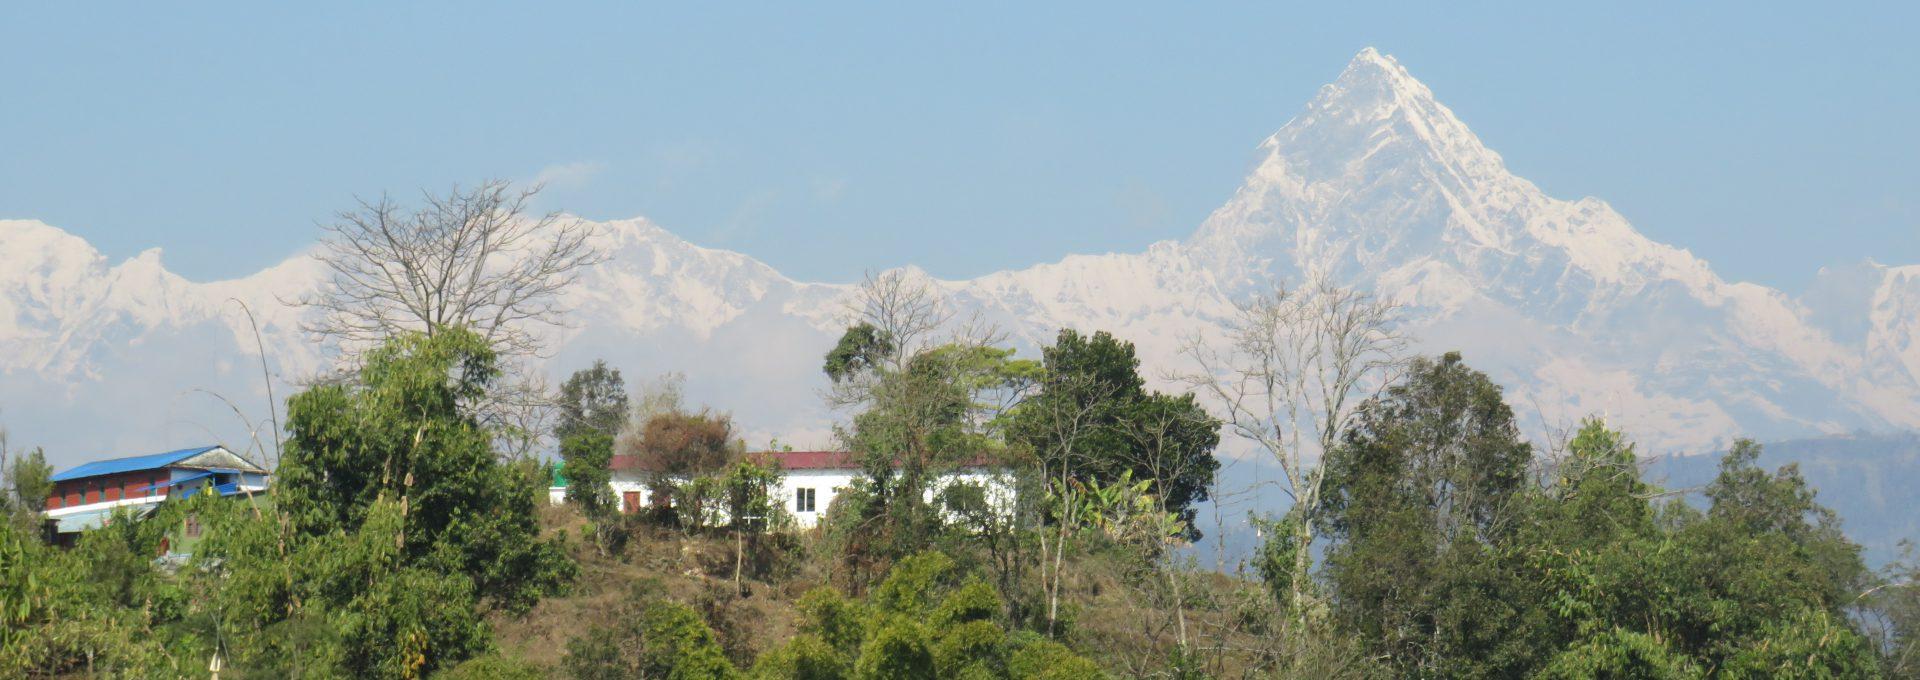 Nepal Travels